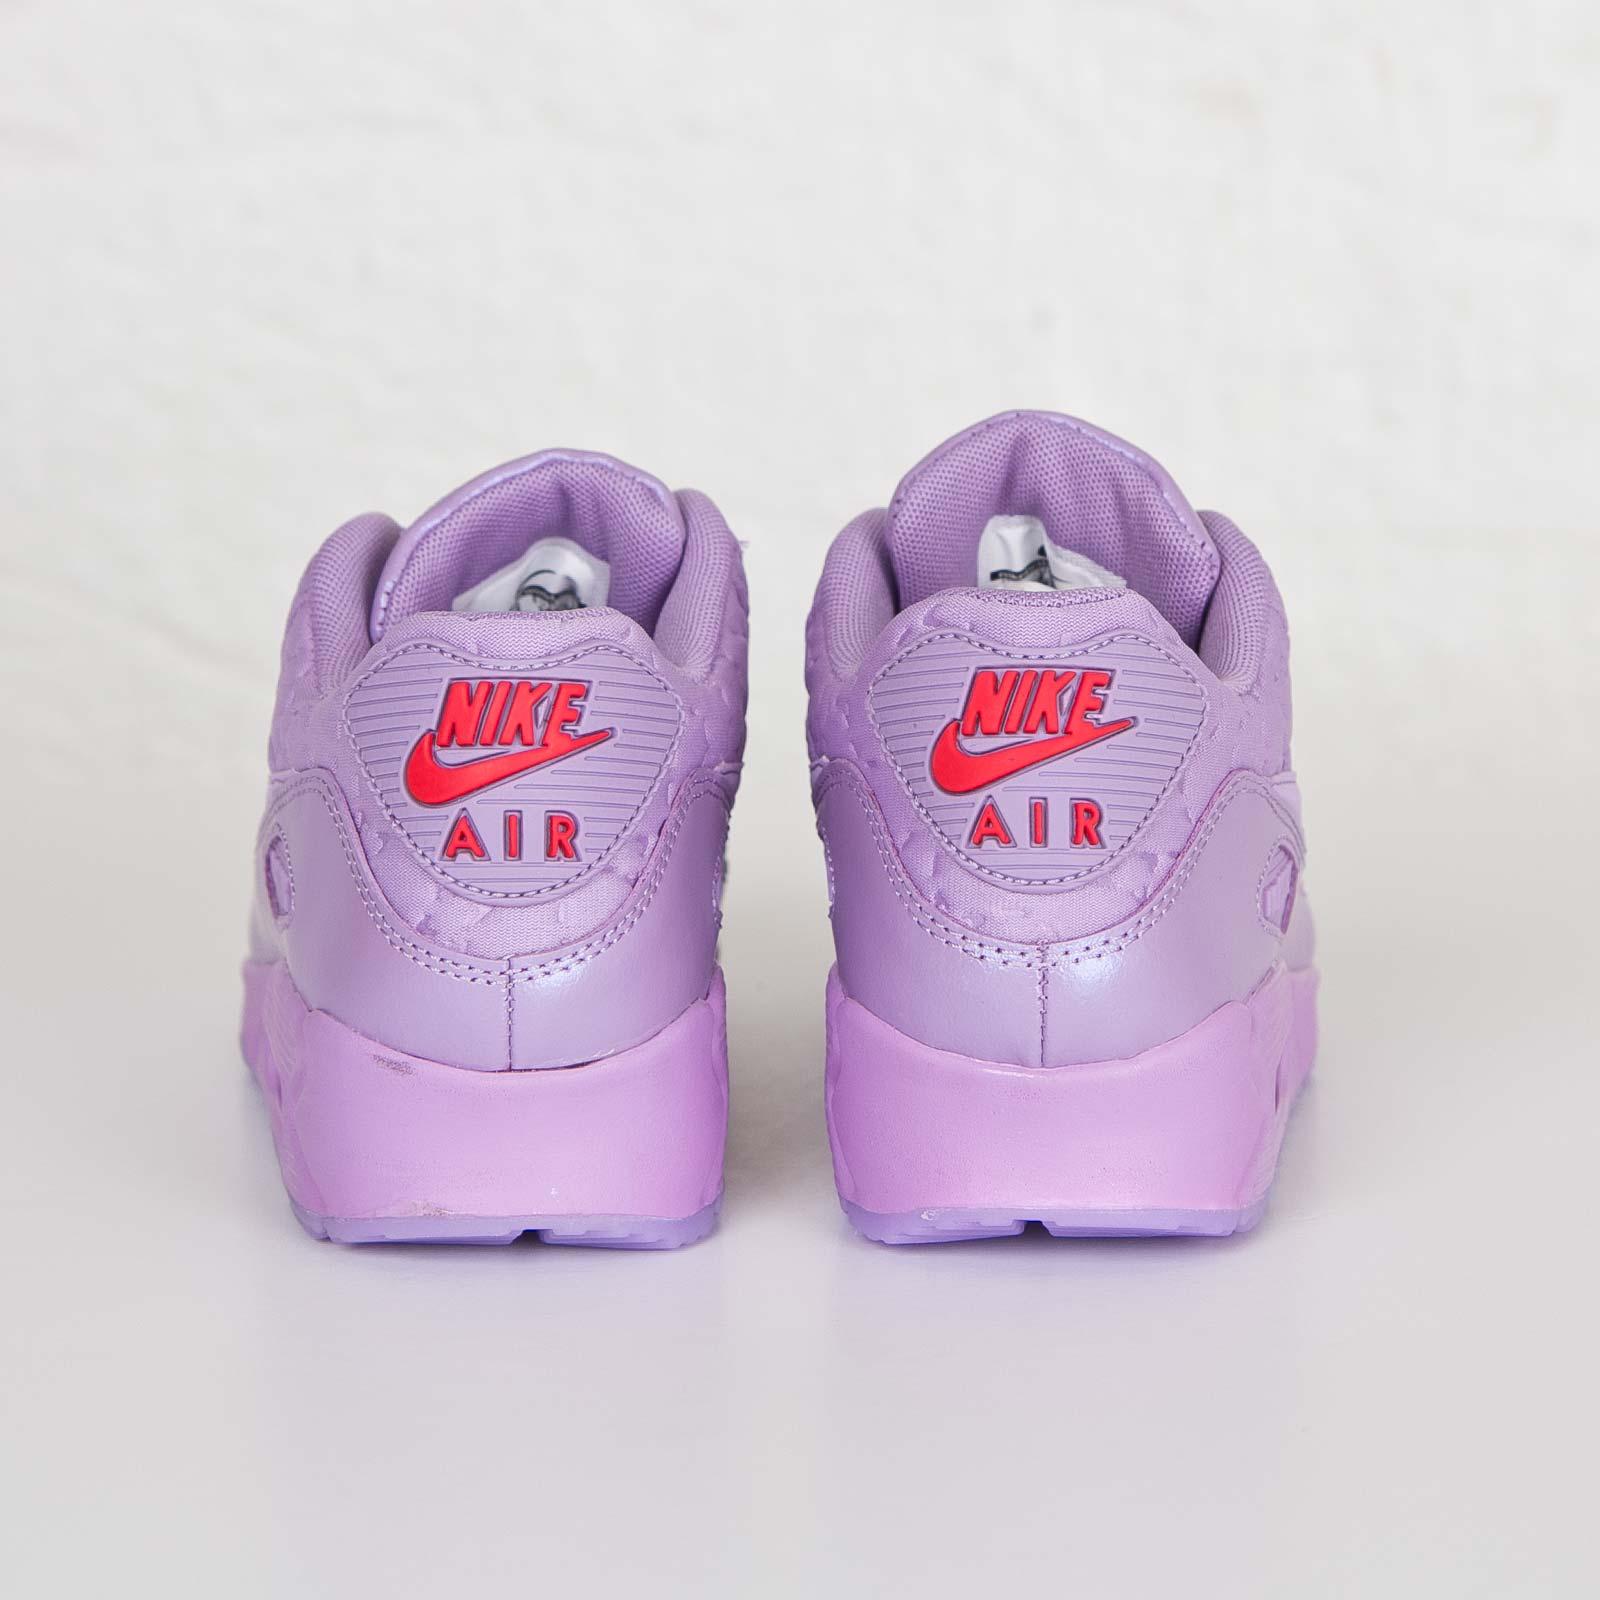 Adidas Originals Falcon Sneakers AshpeaAshpeaOwhite